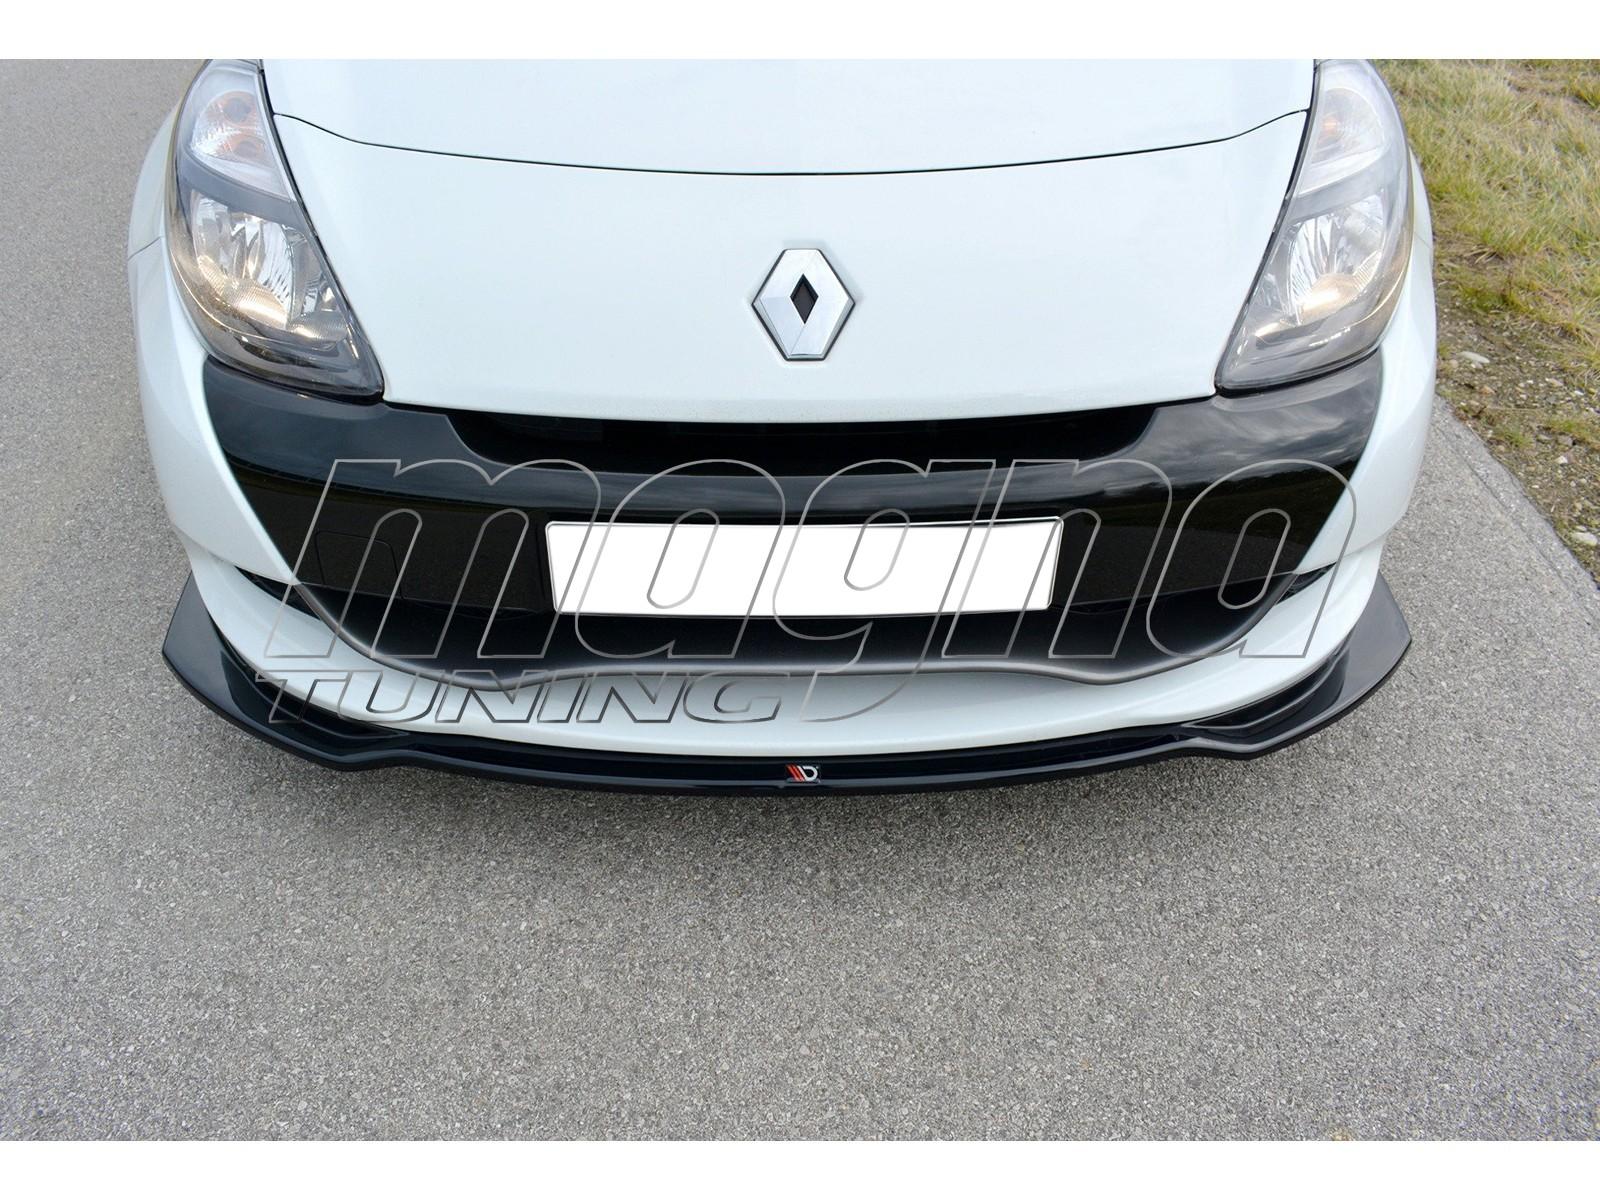 Renault Clio MK3 RS Matrix Front Bumper Extension